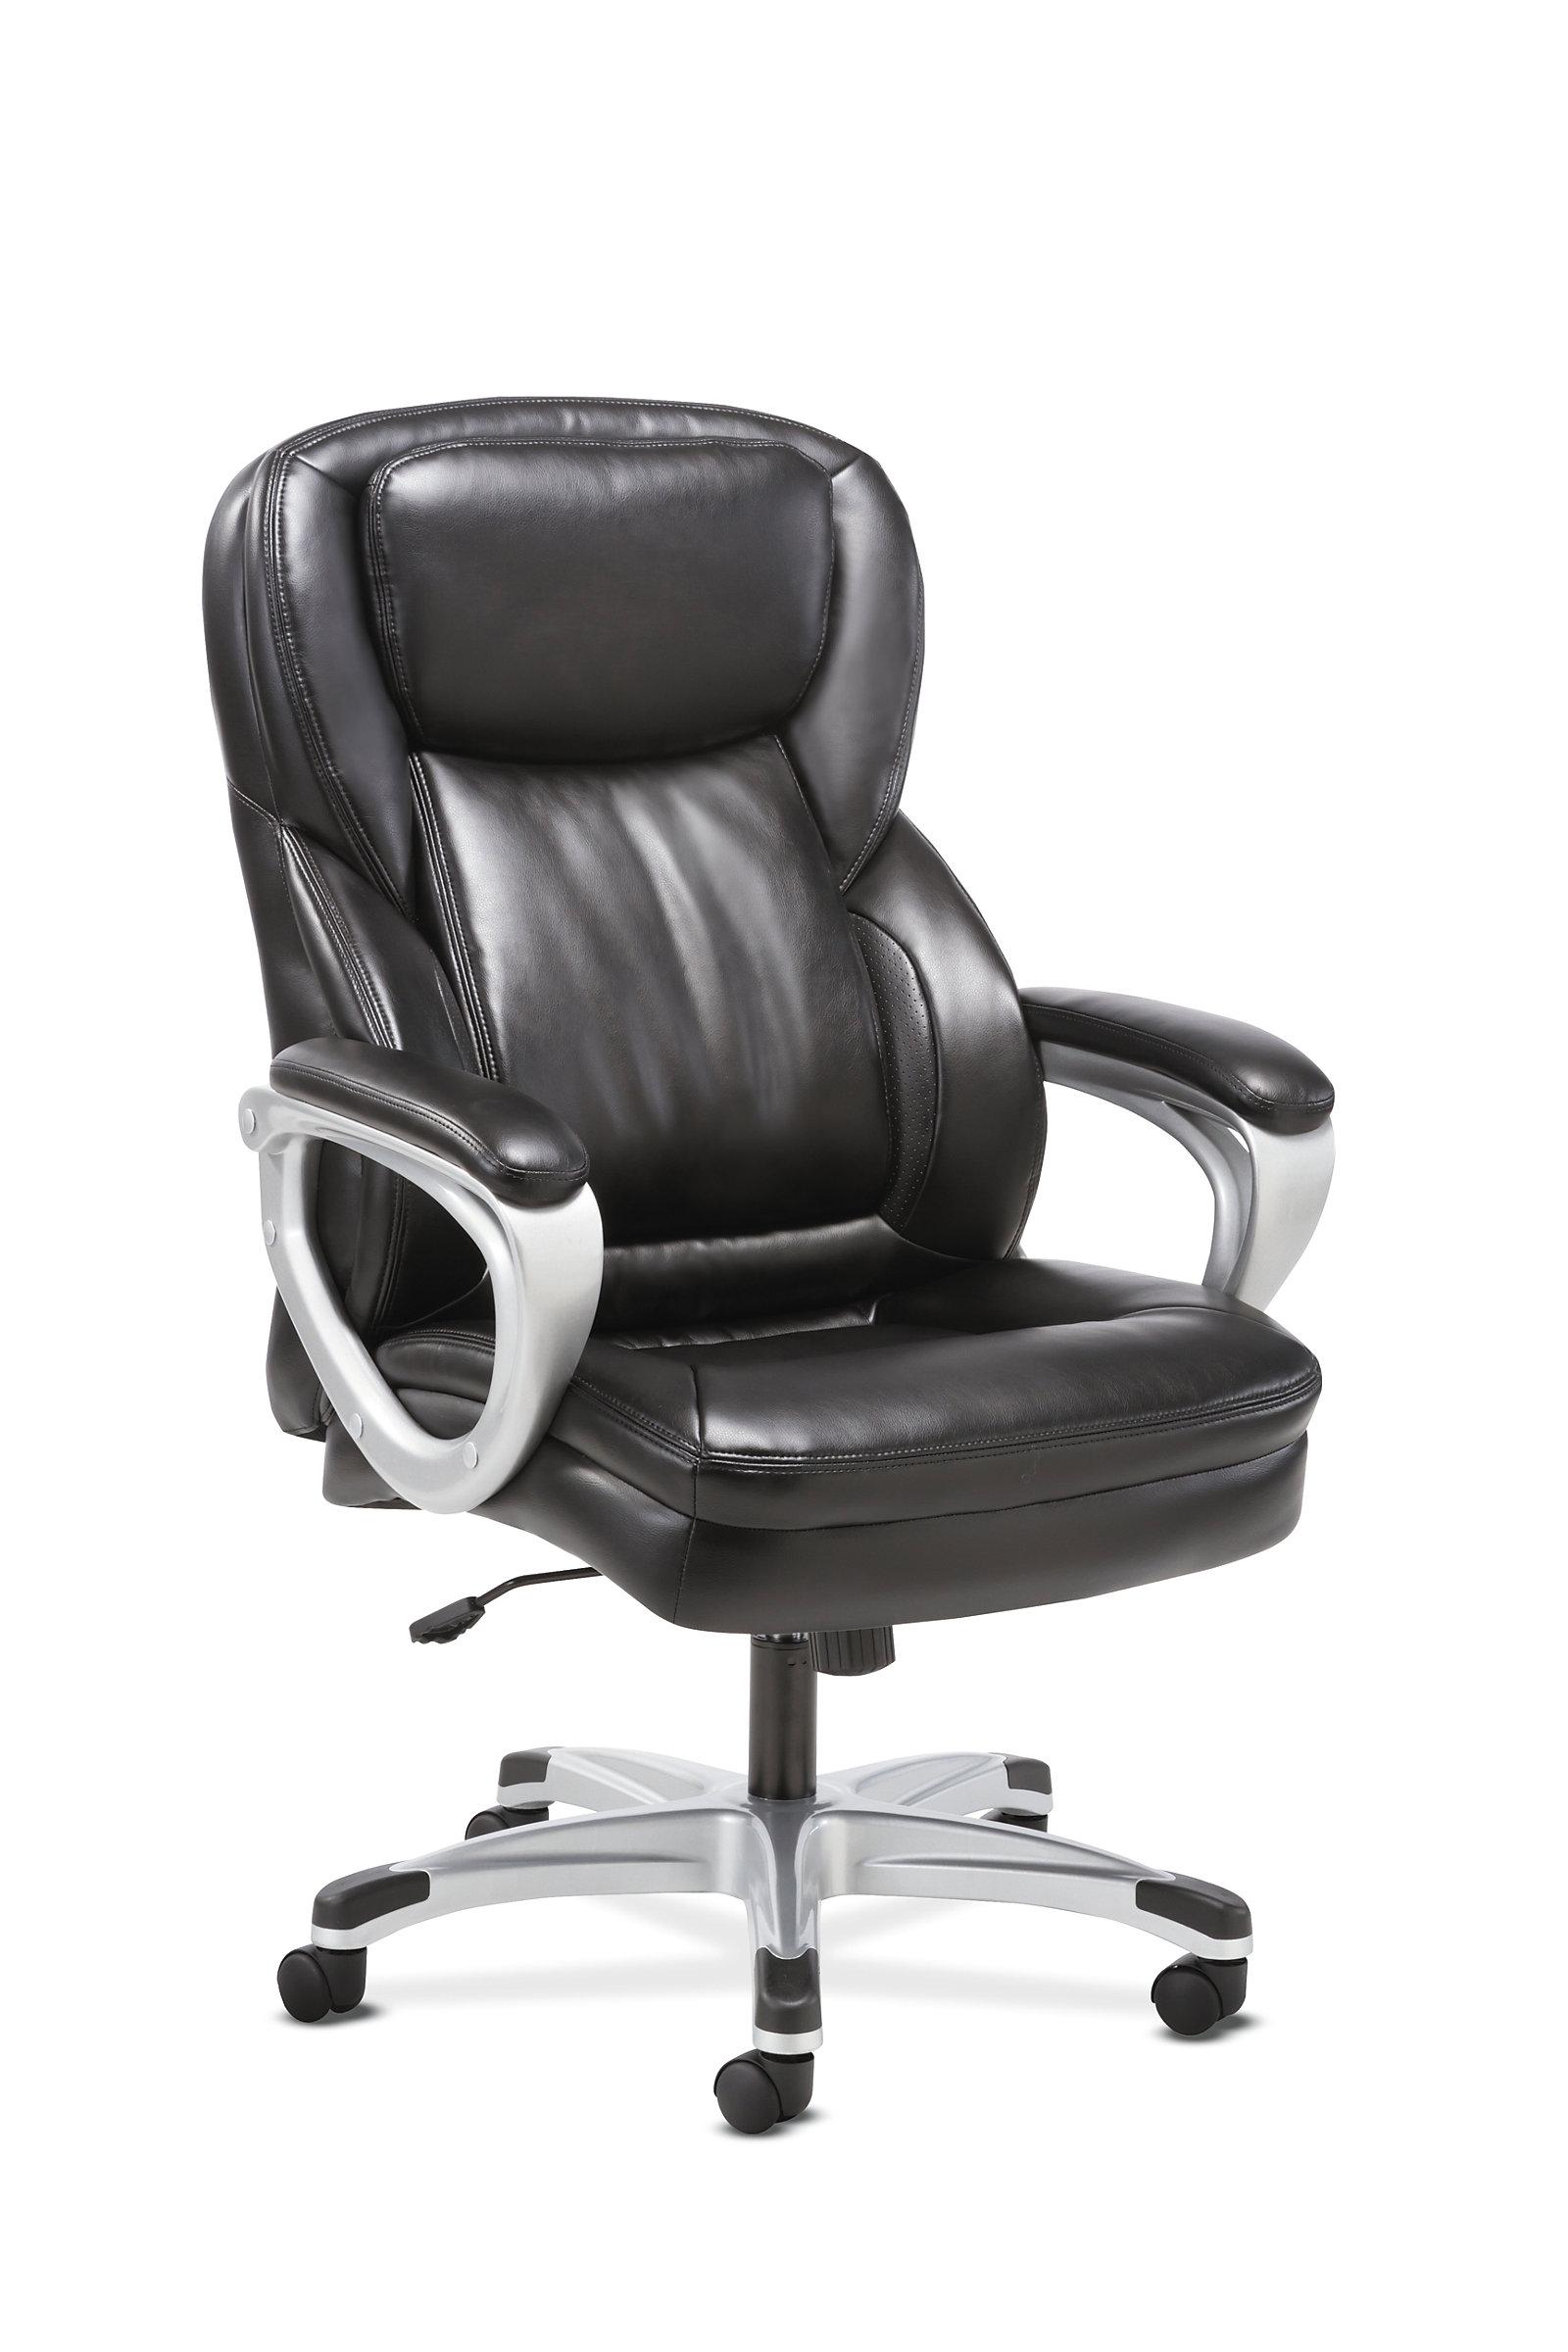 sadie chairs sadie executive high back chair upholstered back